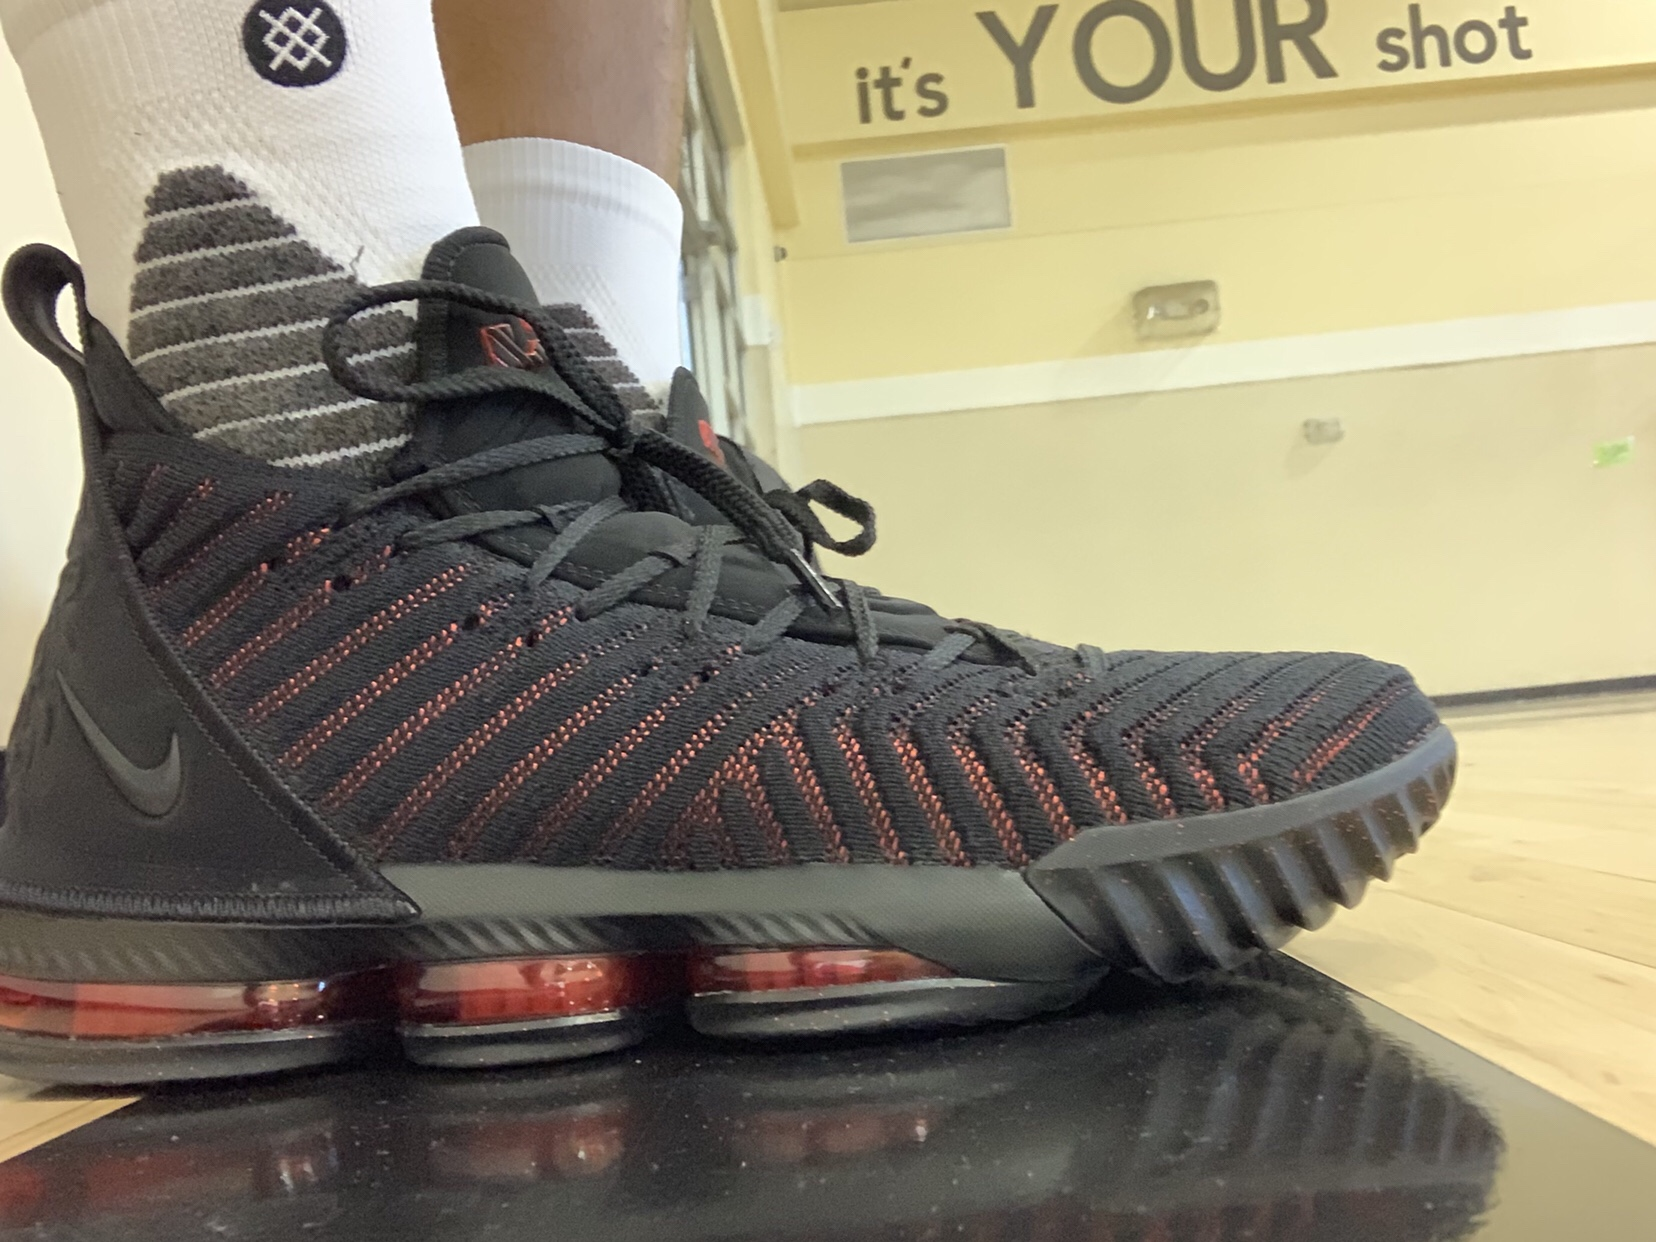 Nike Lebron XVI 16 Performance Analysis and Review